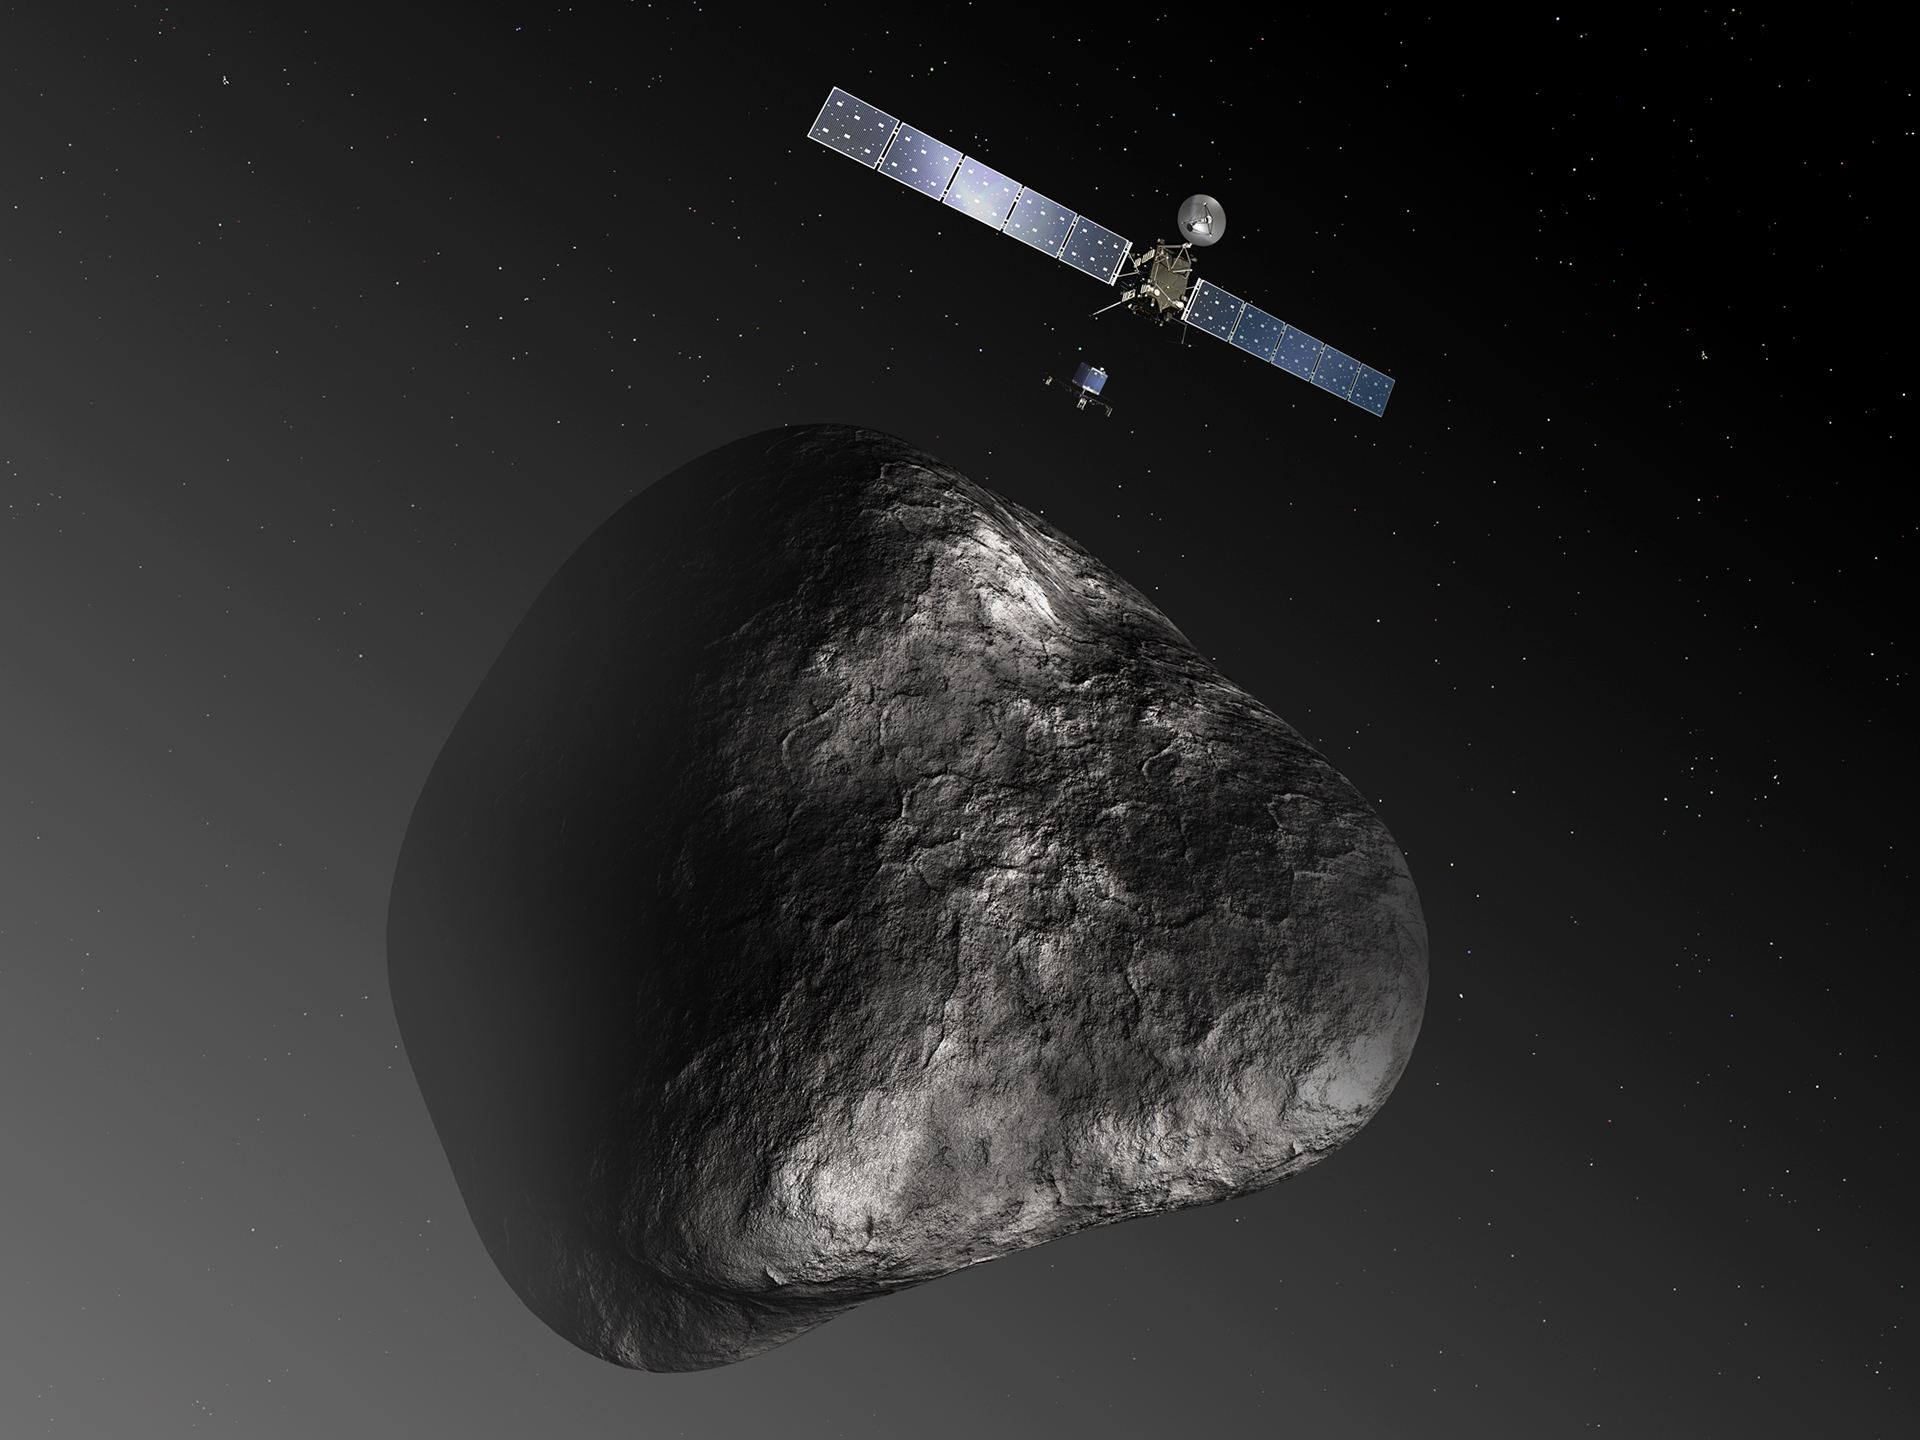 Colorado's Science Fair Stars // Rosetta Comet Mission